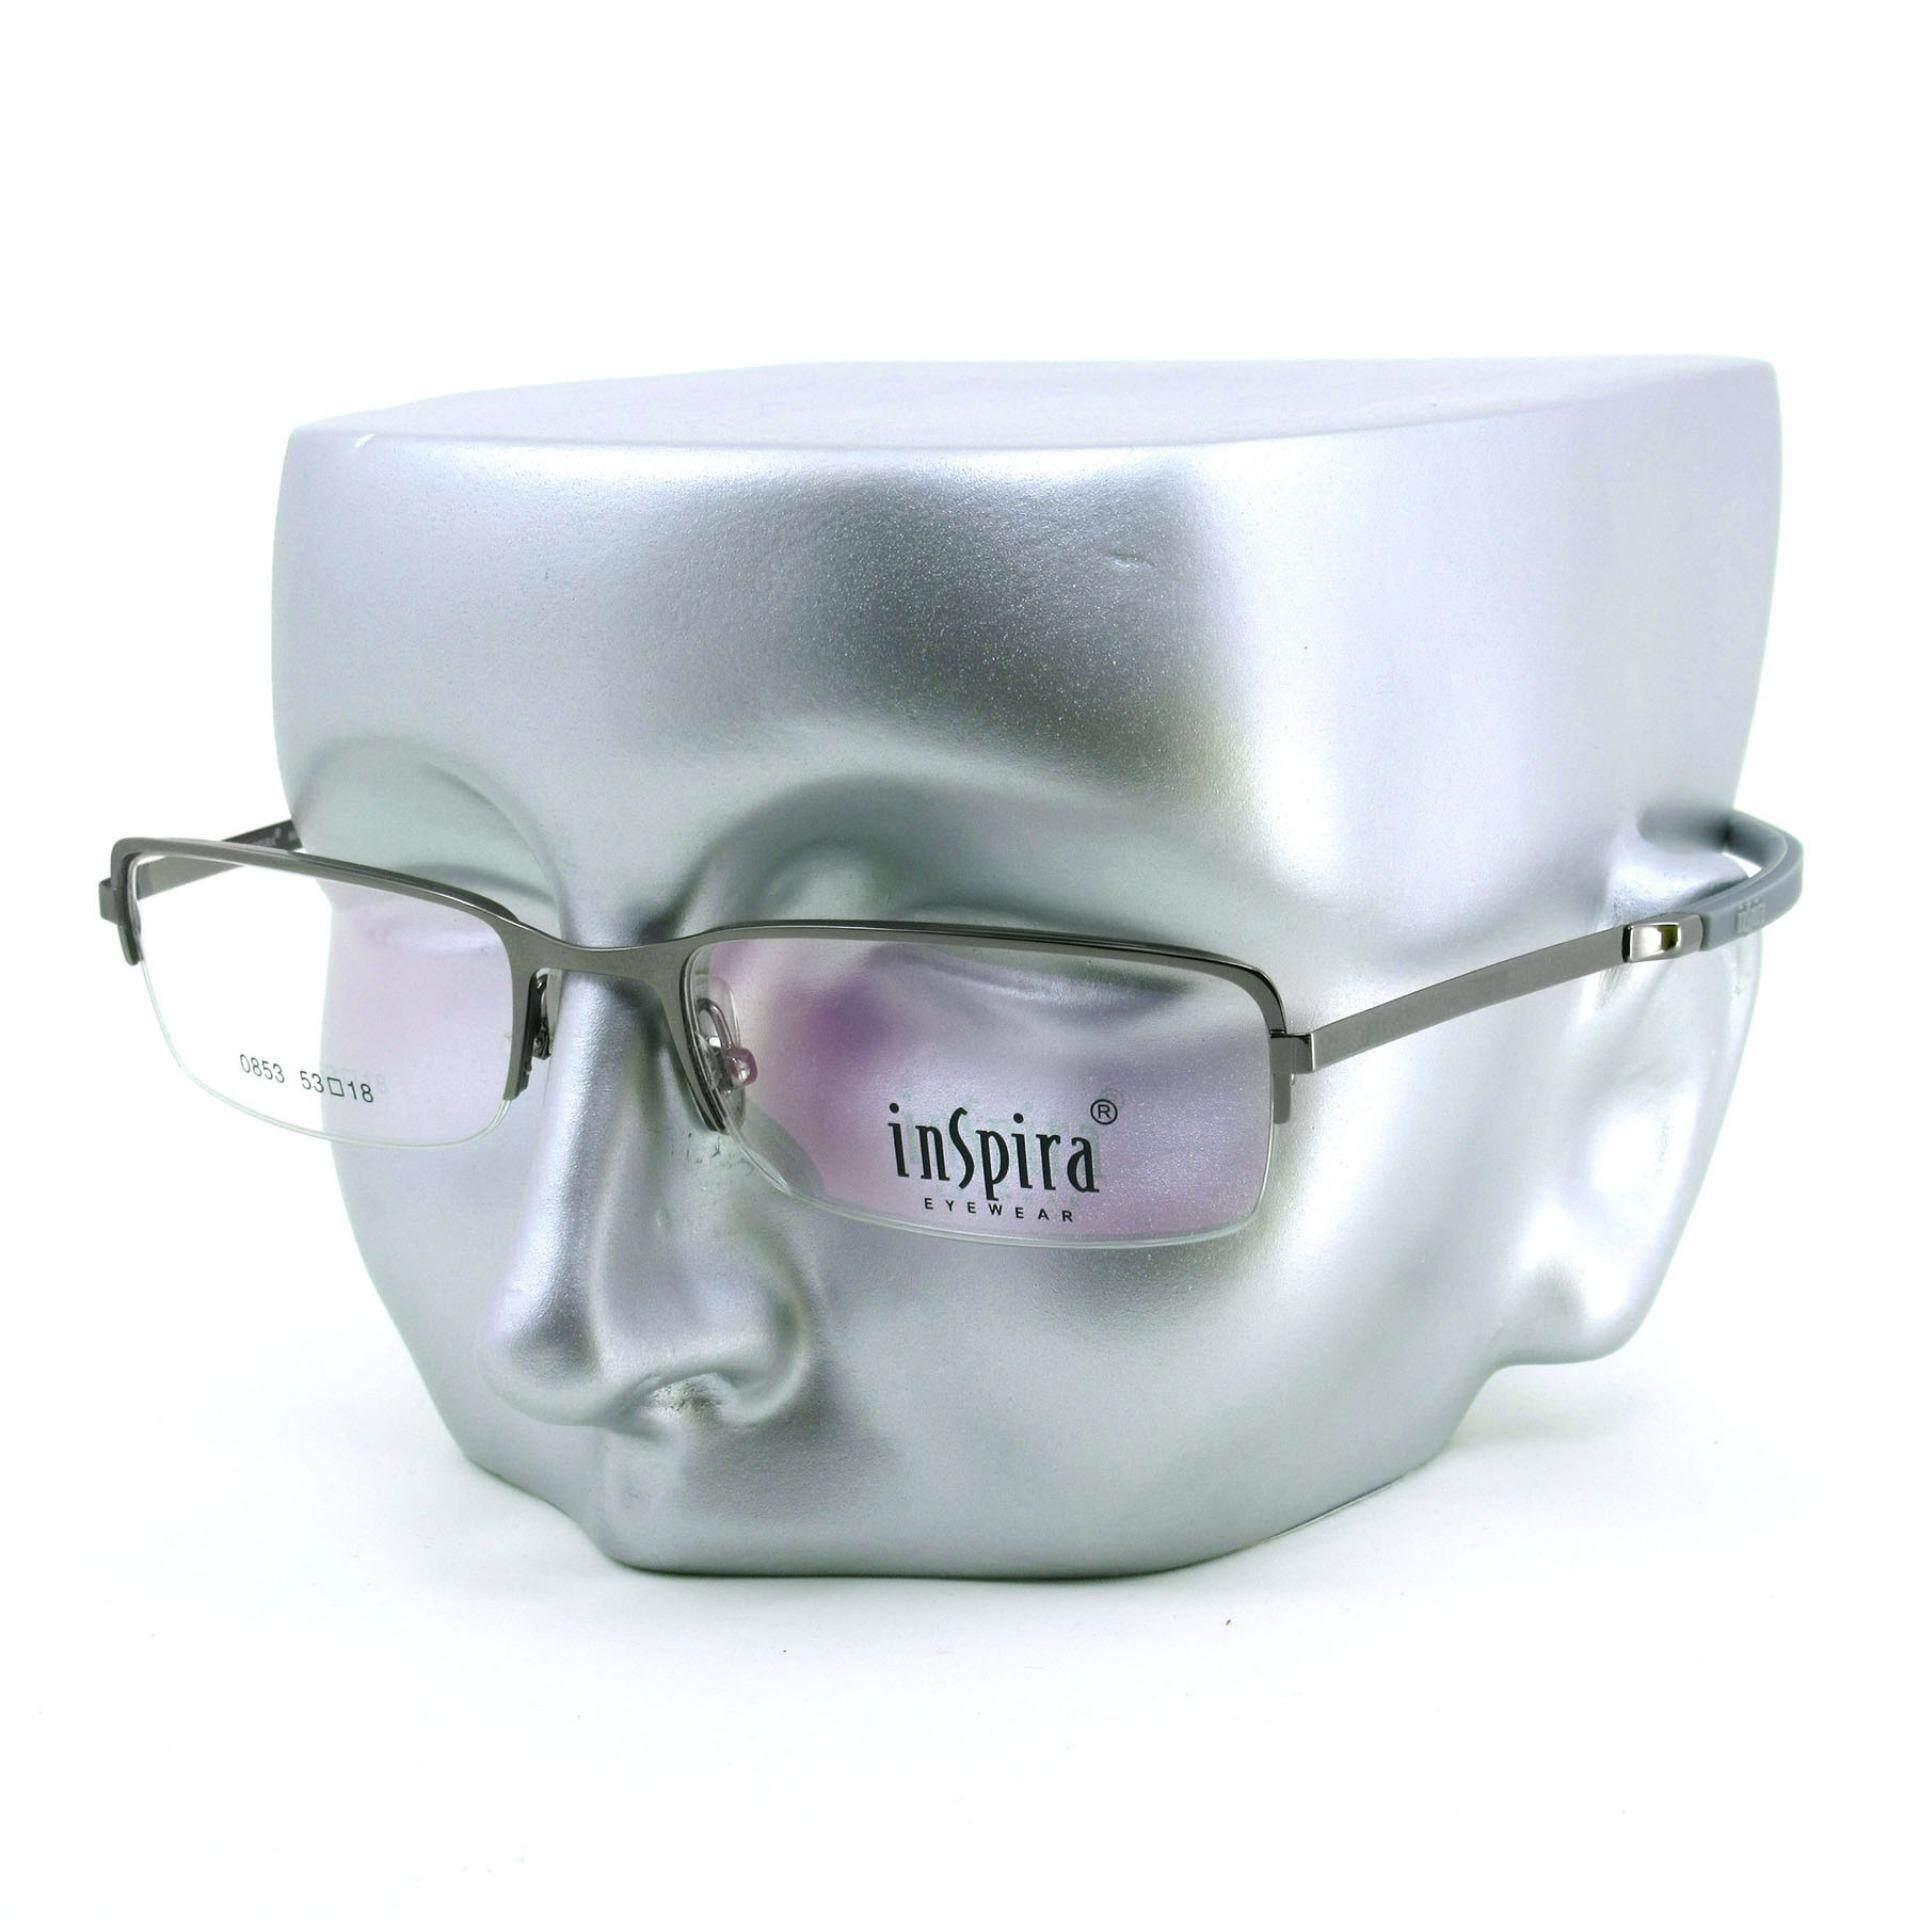 Inspira แว่นตา รุ่น 0853 กรอบแว่นตา ( สำหรับตัดเลนส์ ) ทรงสปอร์ต วัสดุ สแตนเลสสตีล หรือเหล็กกล้าไร้สนิม Stainless Steel ขาสปริง กรอบแว่นตา EyewearTop Glasses